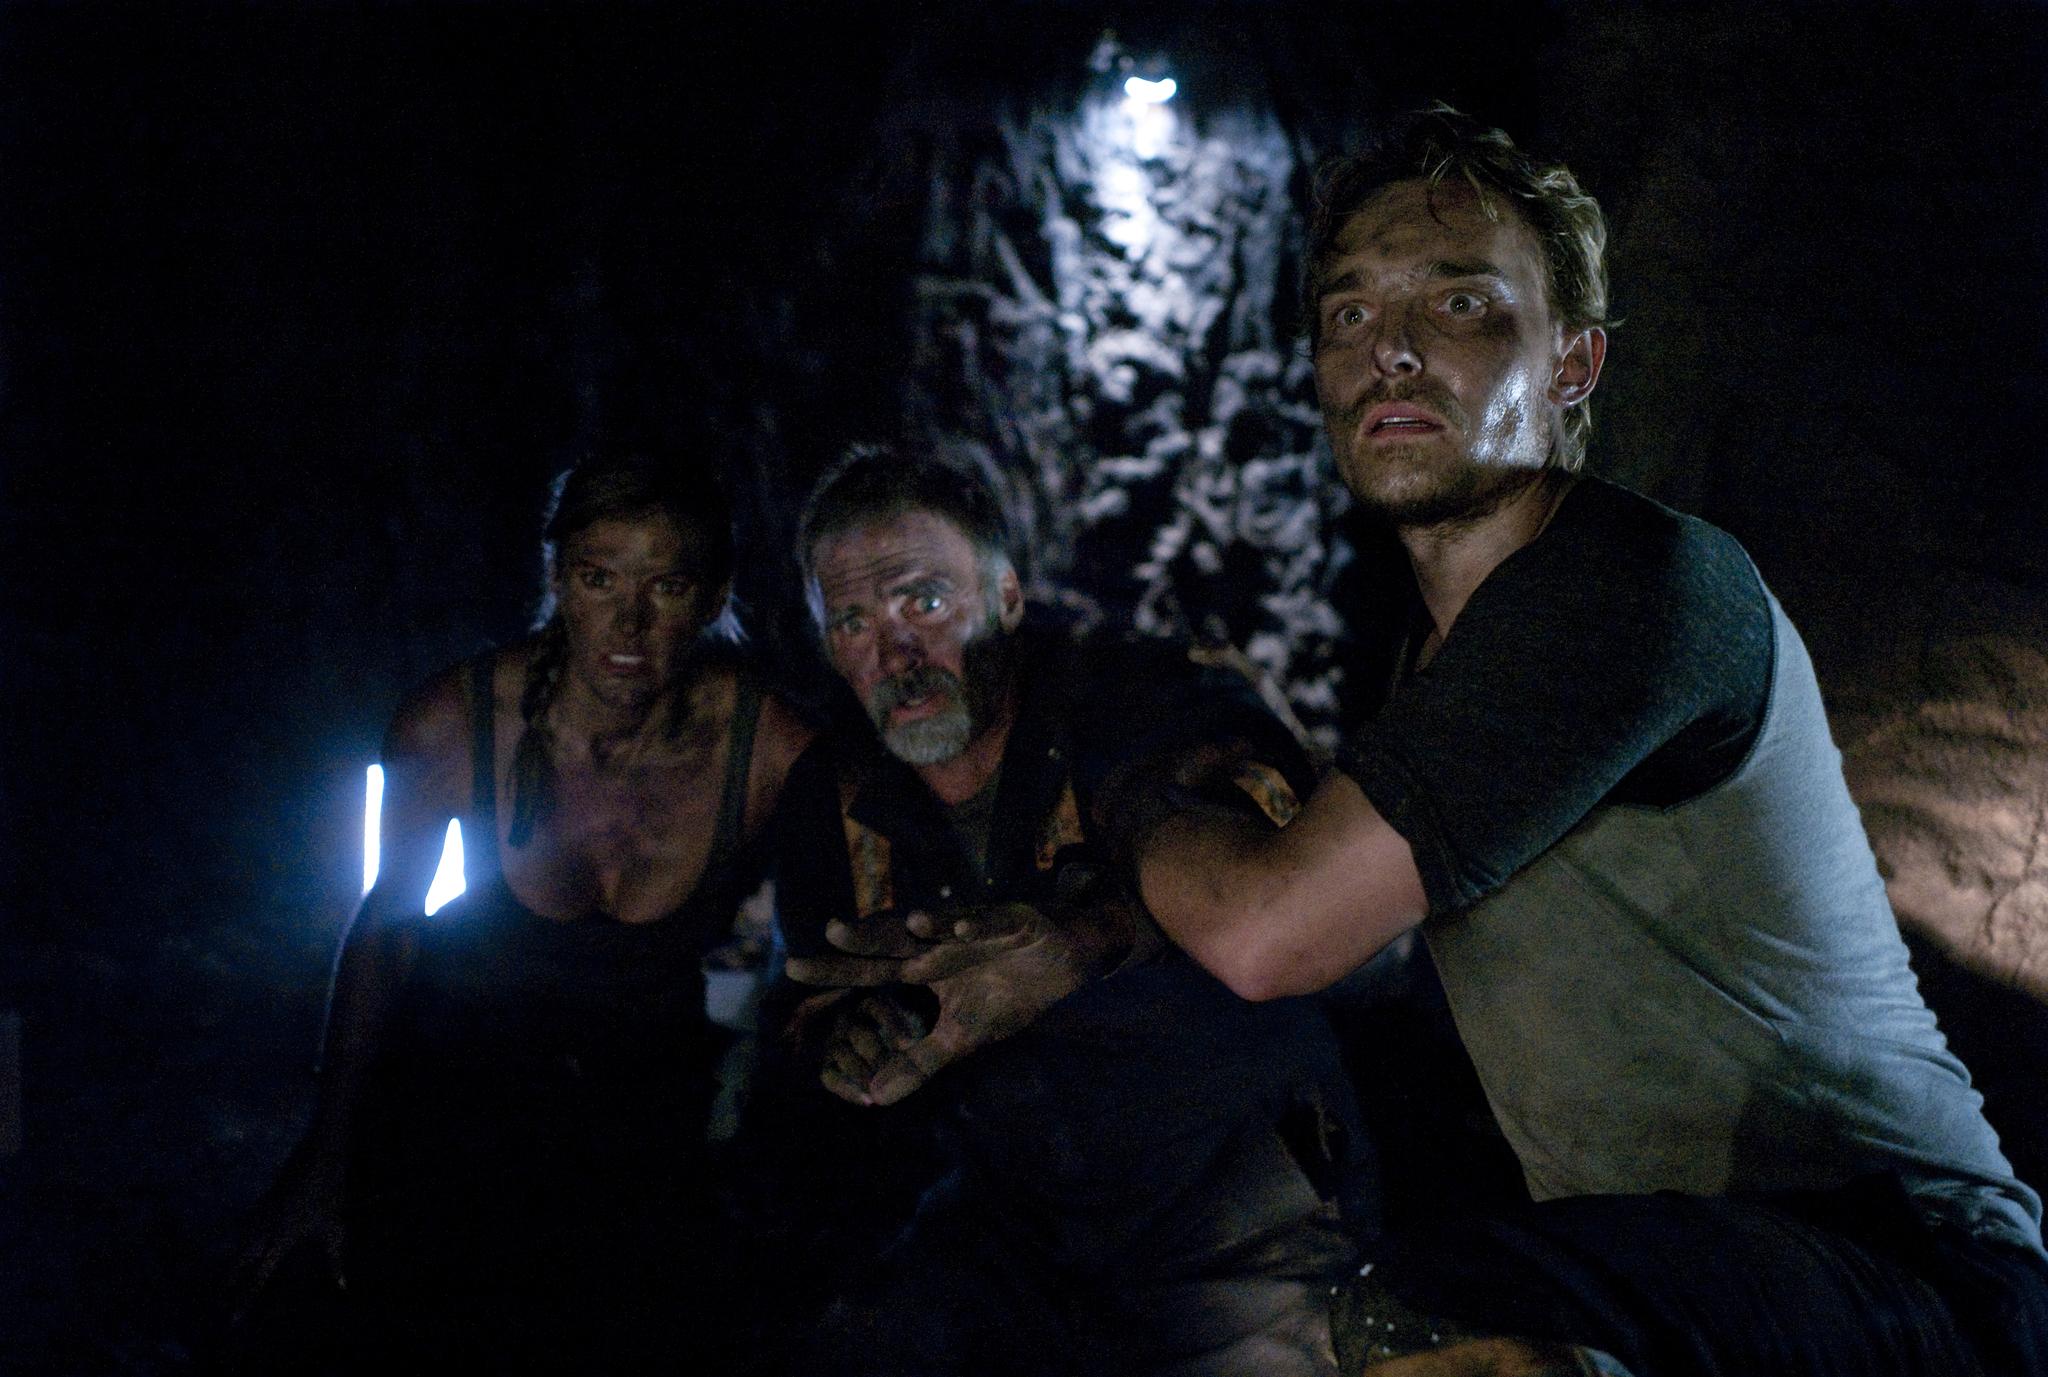 Jeff Fahey, Joey Kern, and Kelly Noonan in Beneath (2013)